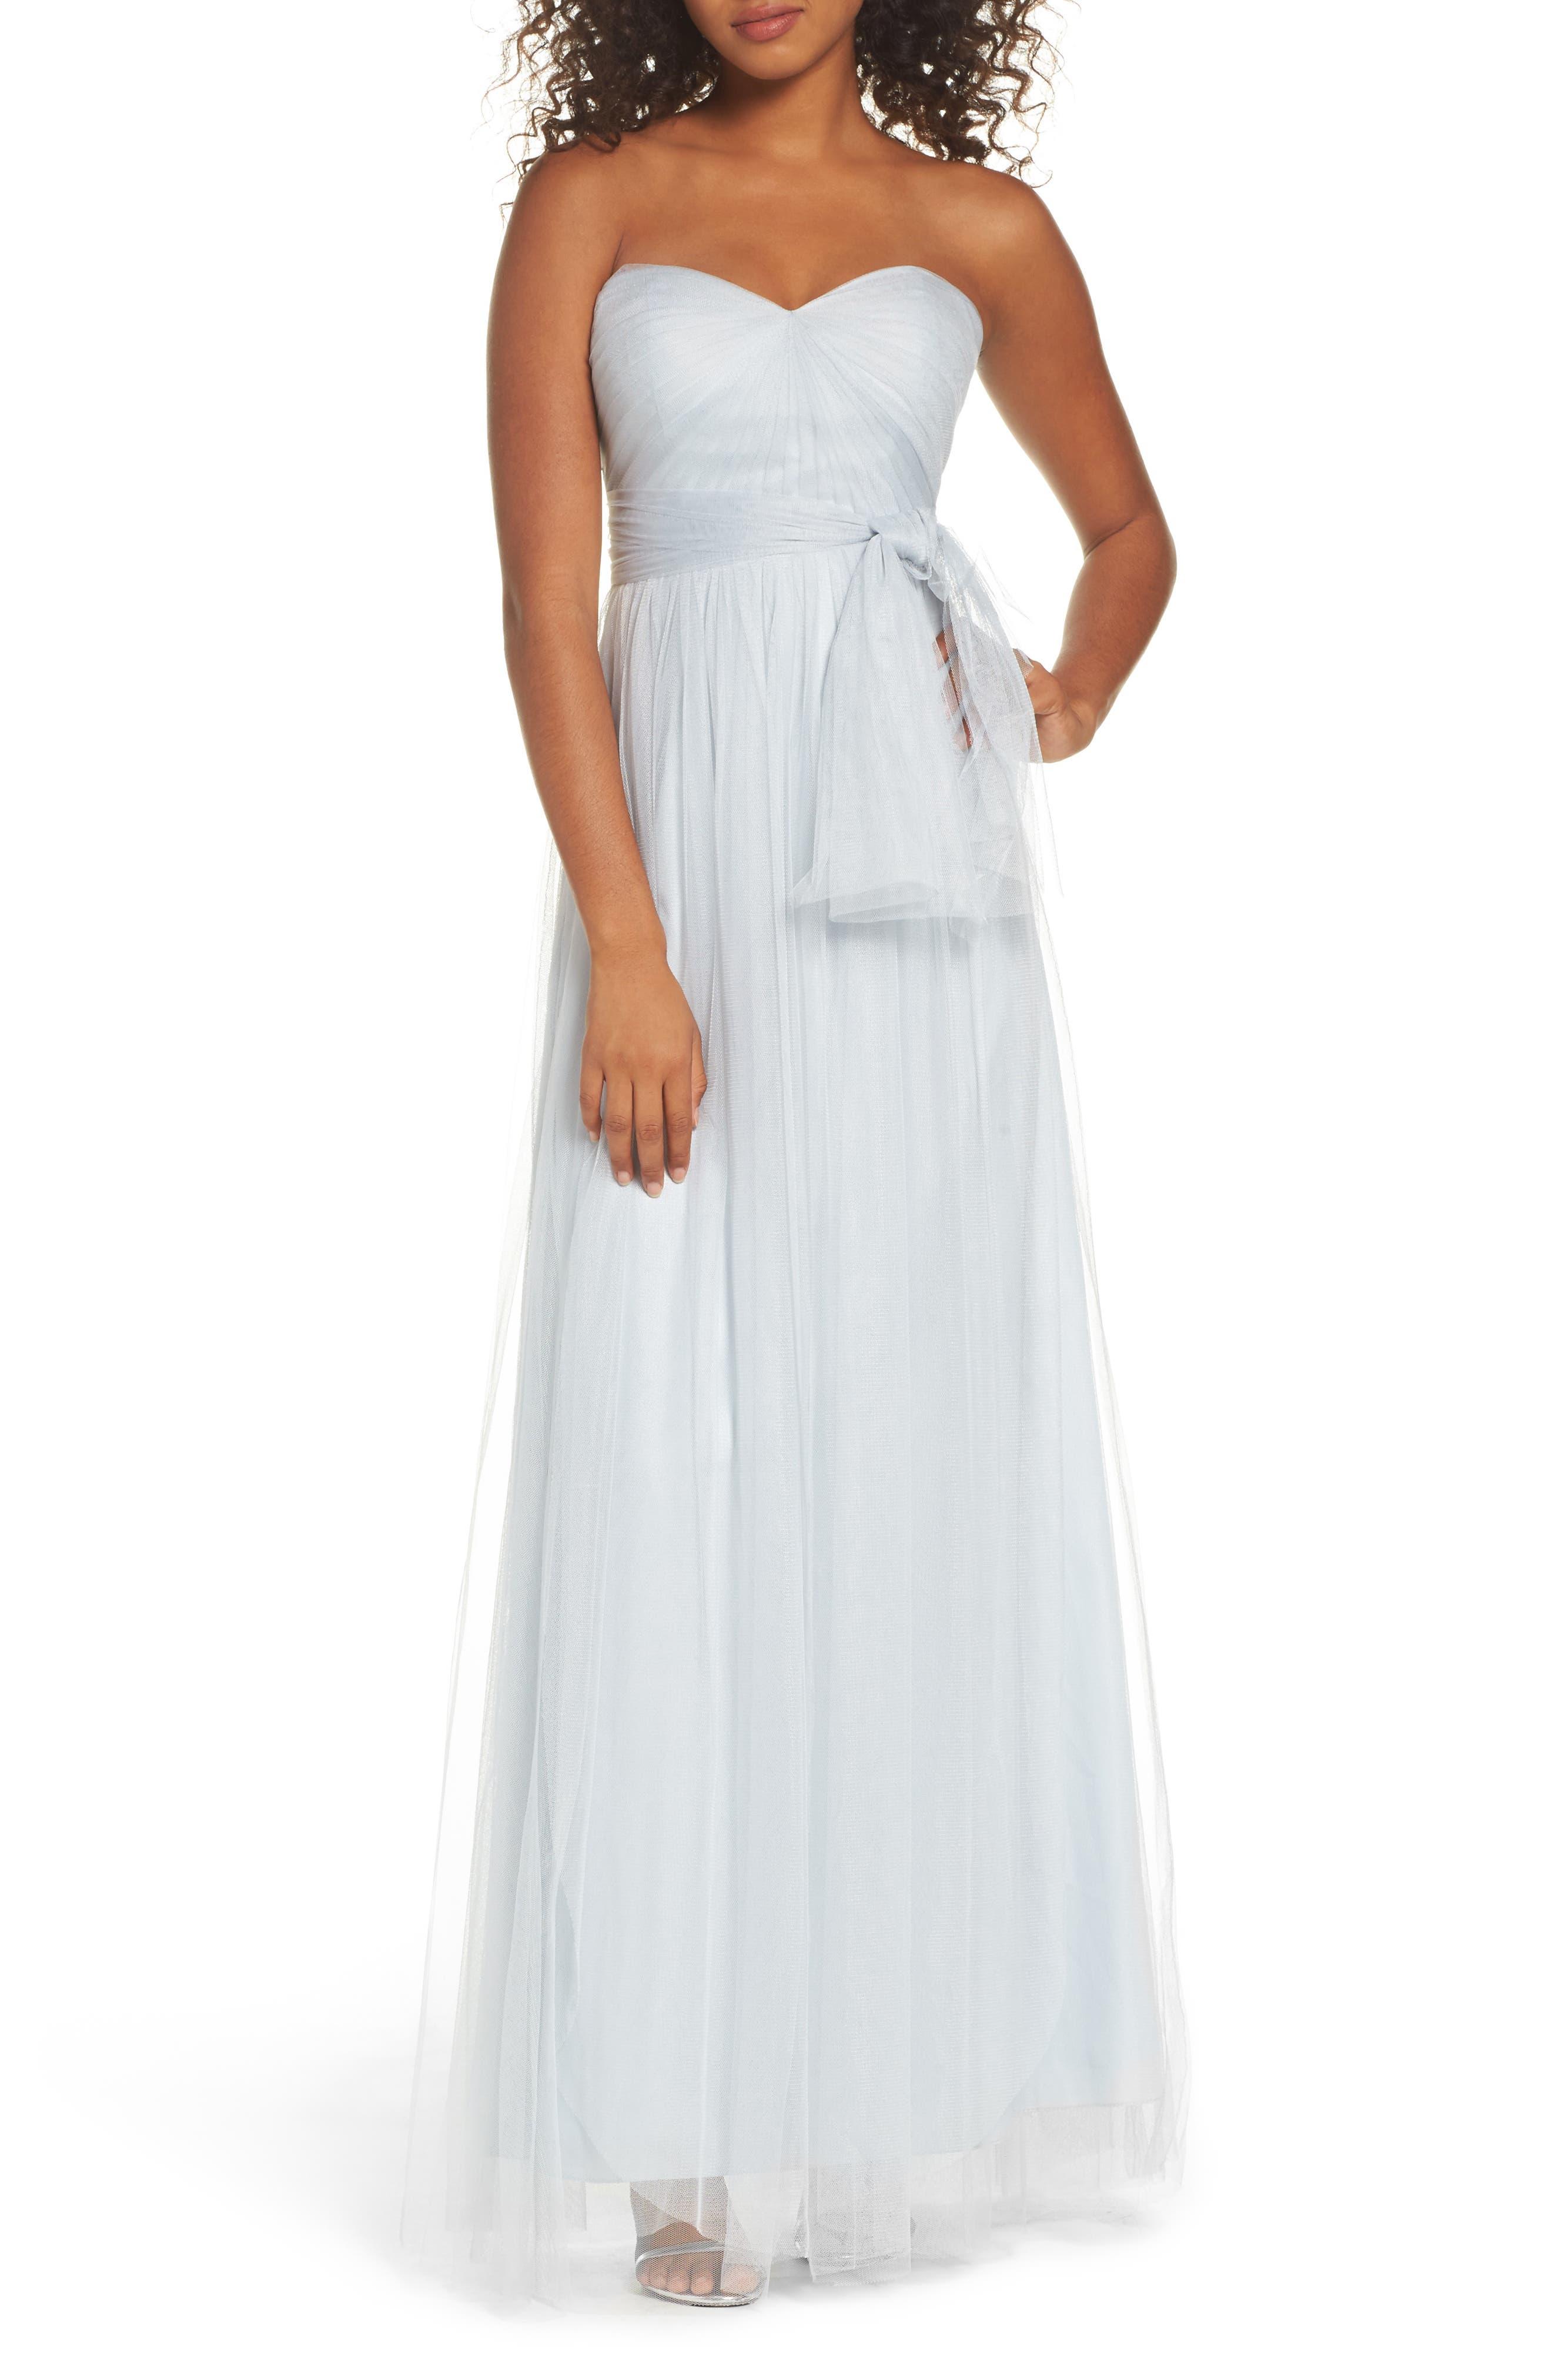 Annabelle Convertible Tulle Column Dress,                             Main thumbnail 1, color,                             Serenity Blue